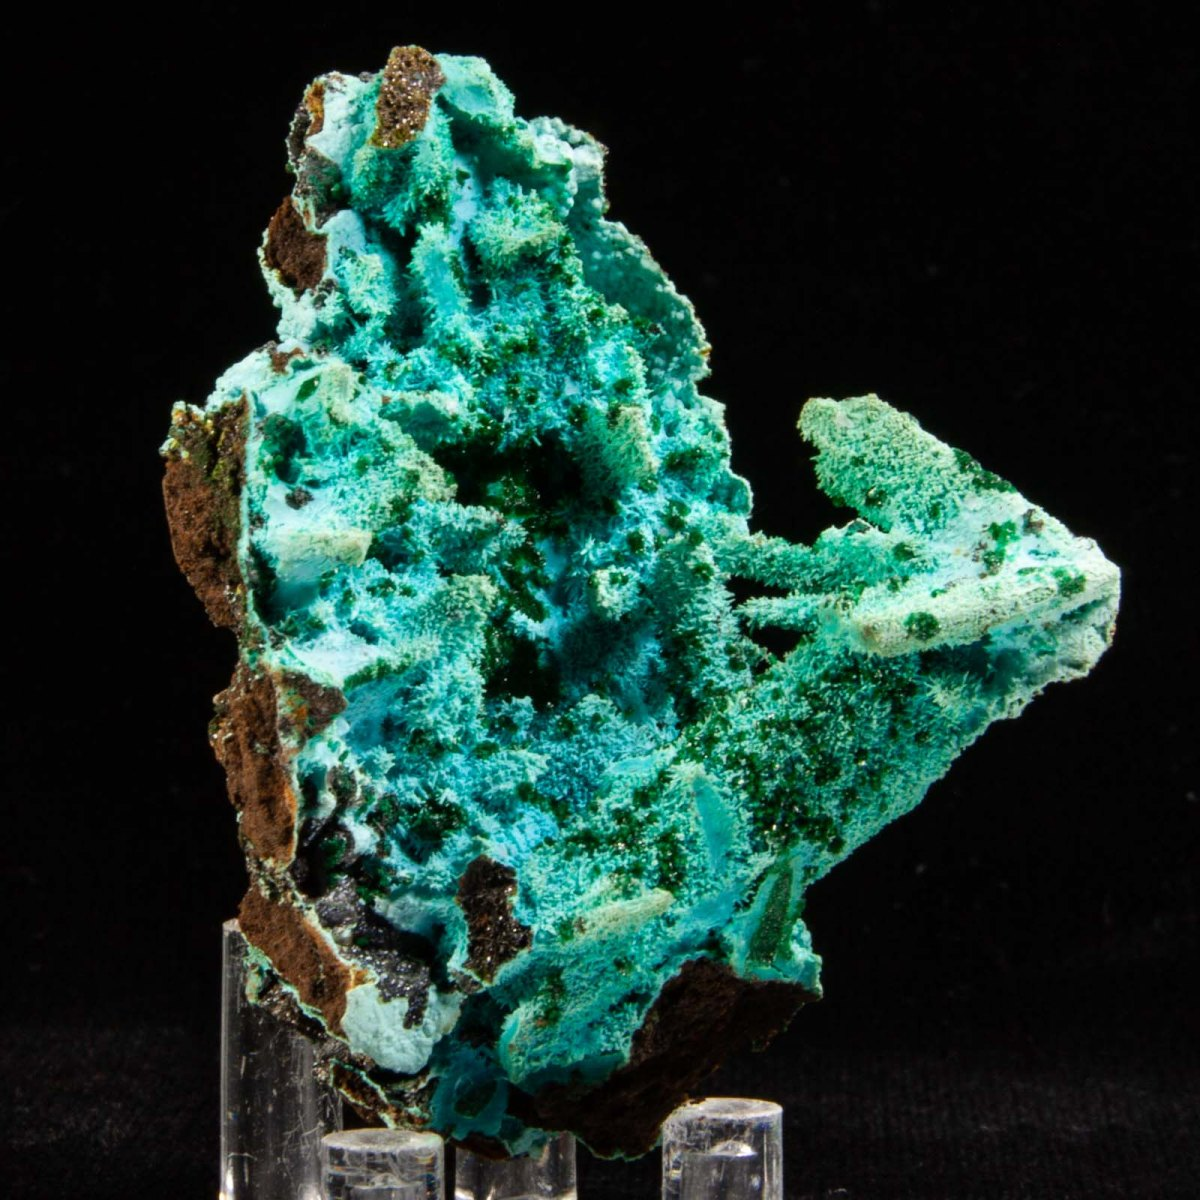 Chrysocolla ps. Malachite ps. Azurite